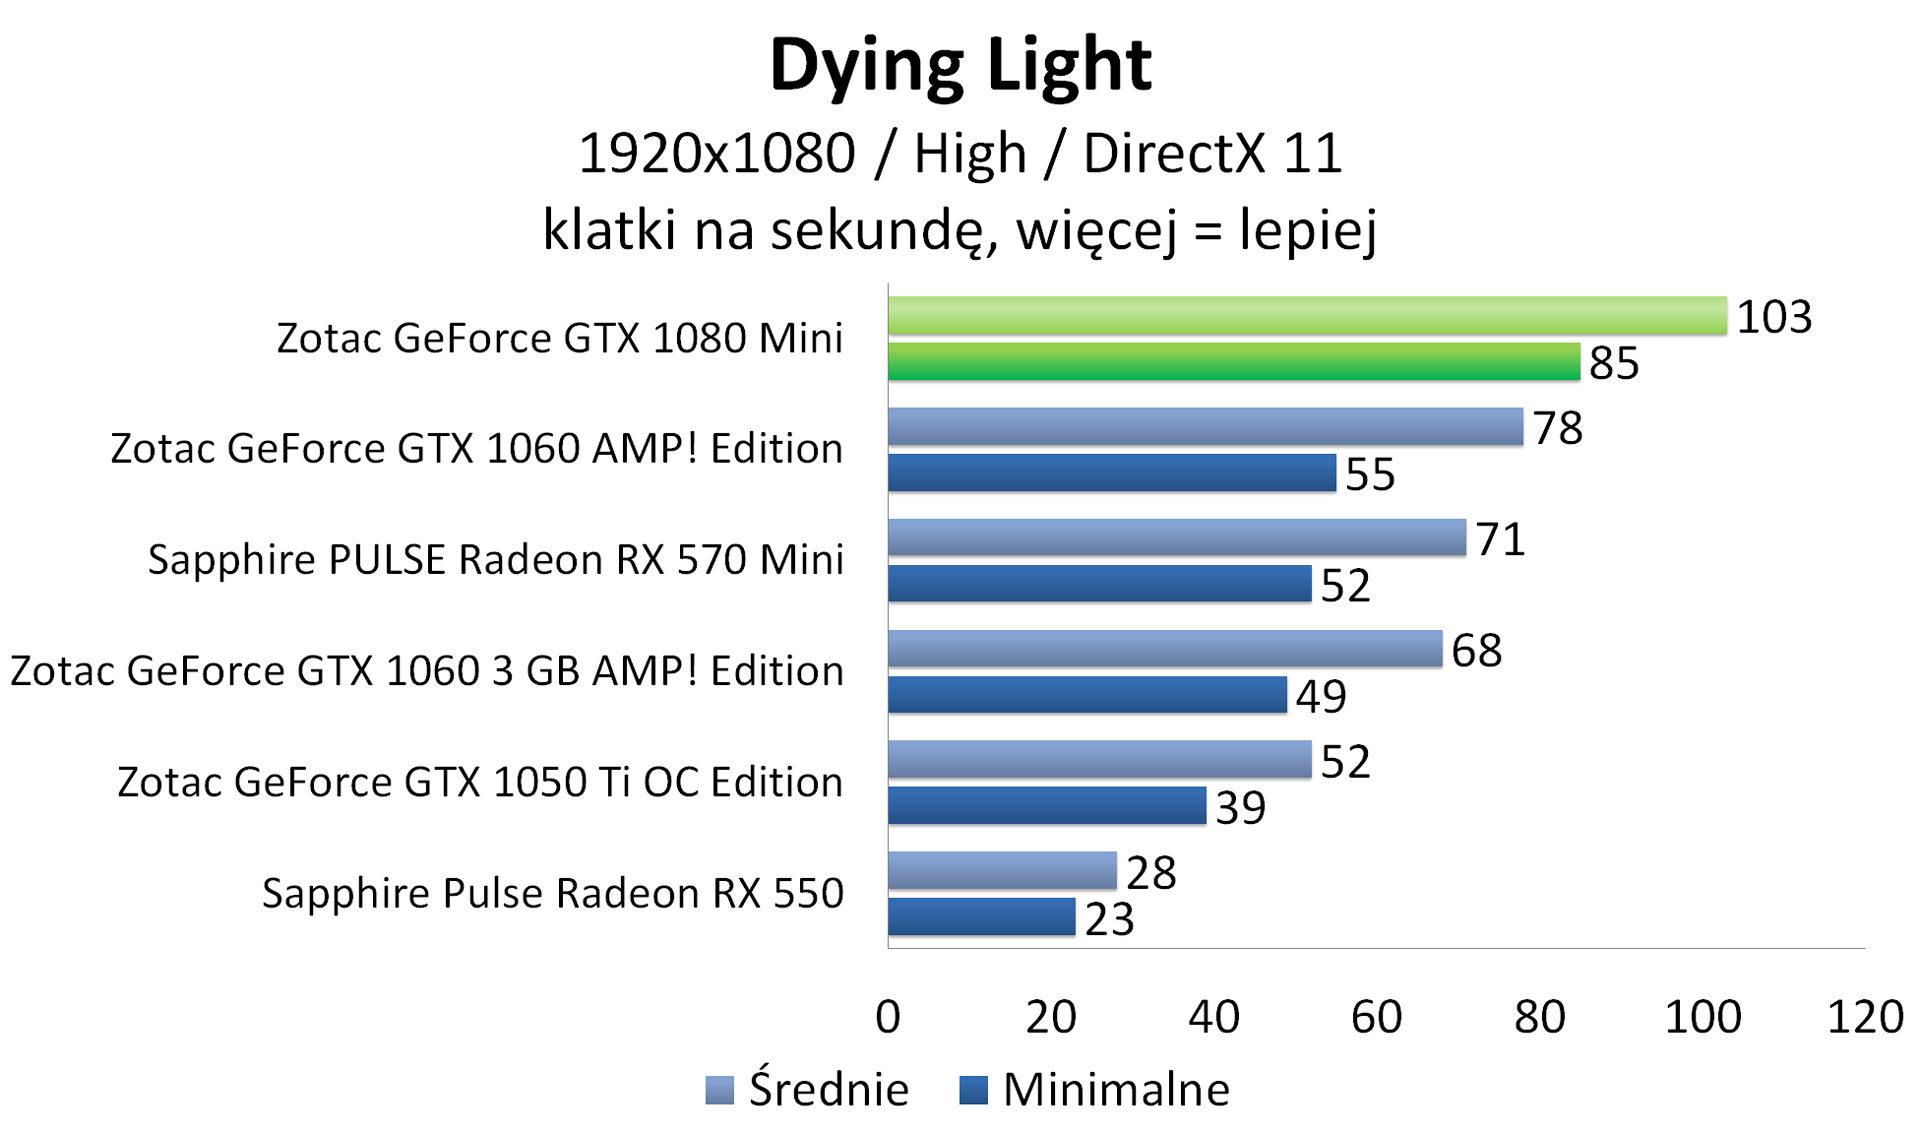 Zotac GeForce GTX 1080 Mini - Dying Light